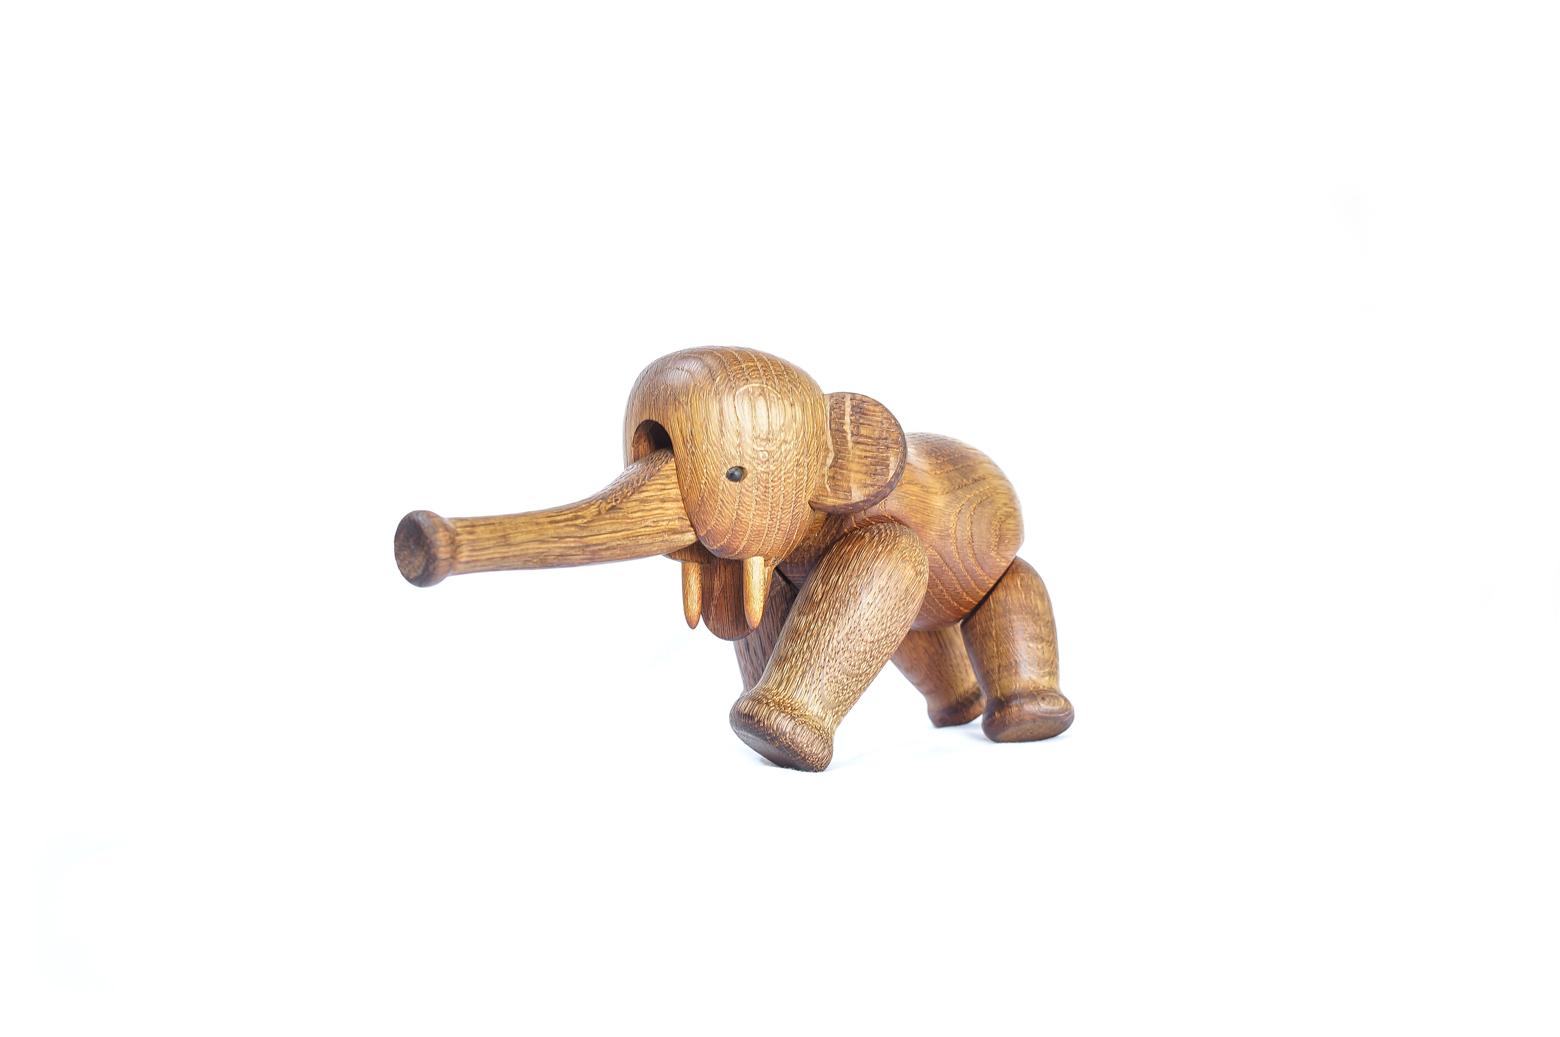 Kay Bojesen Elephant Vintage/カイ・ボイスン エレファント ゾウ ヴィンテージ オーク材 玩具 北欧雑貨